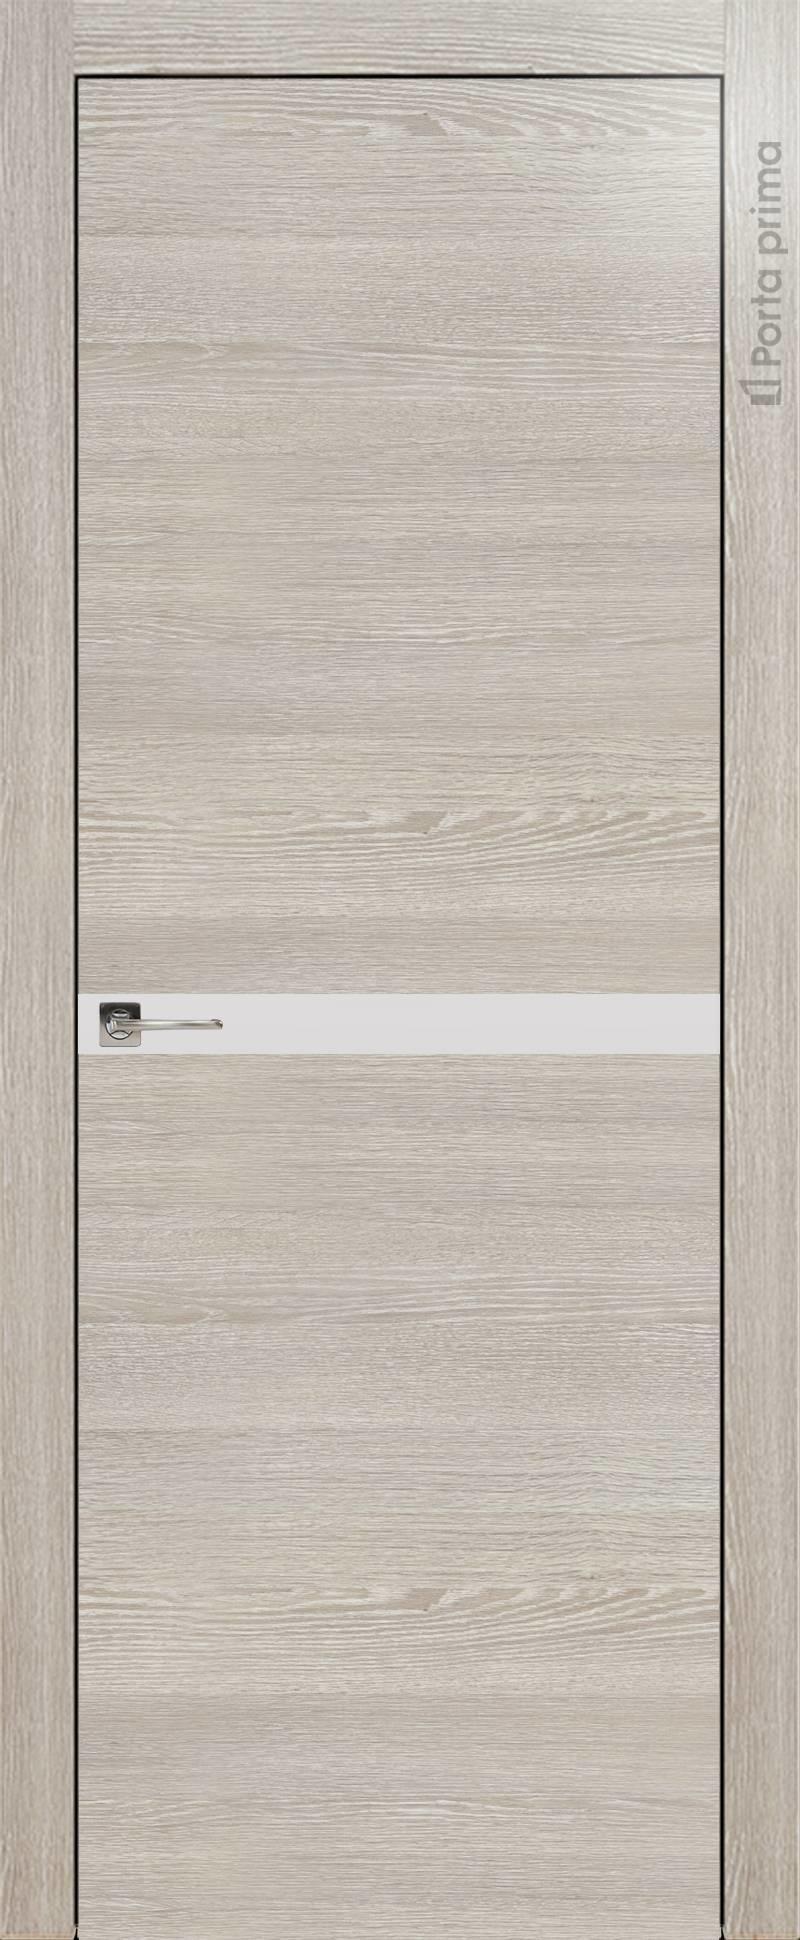 Tivoli Б-4 цвет - Серый дуб Без стекла (ДГ)